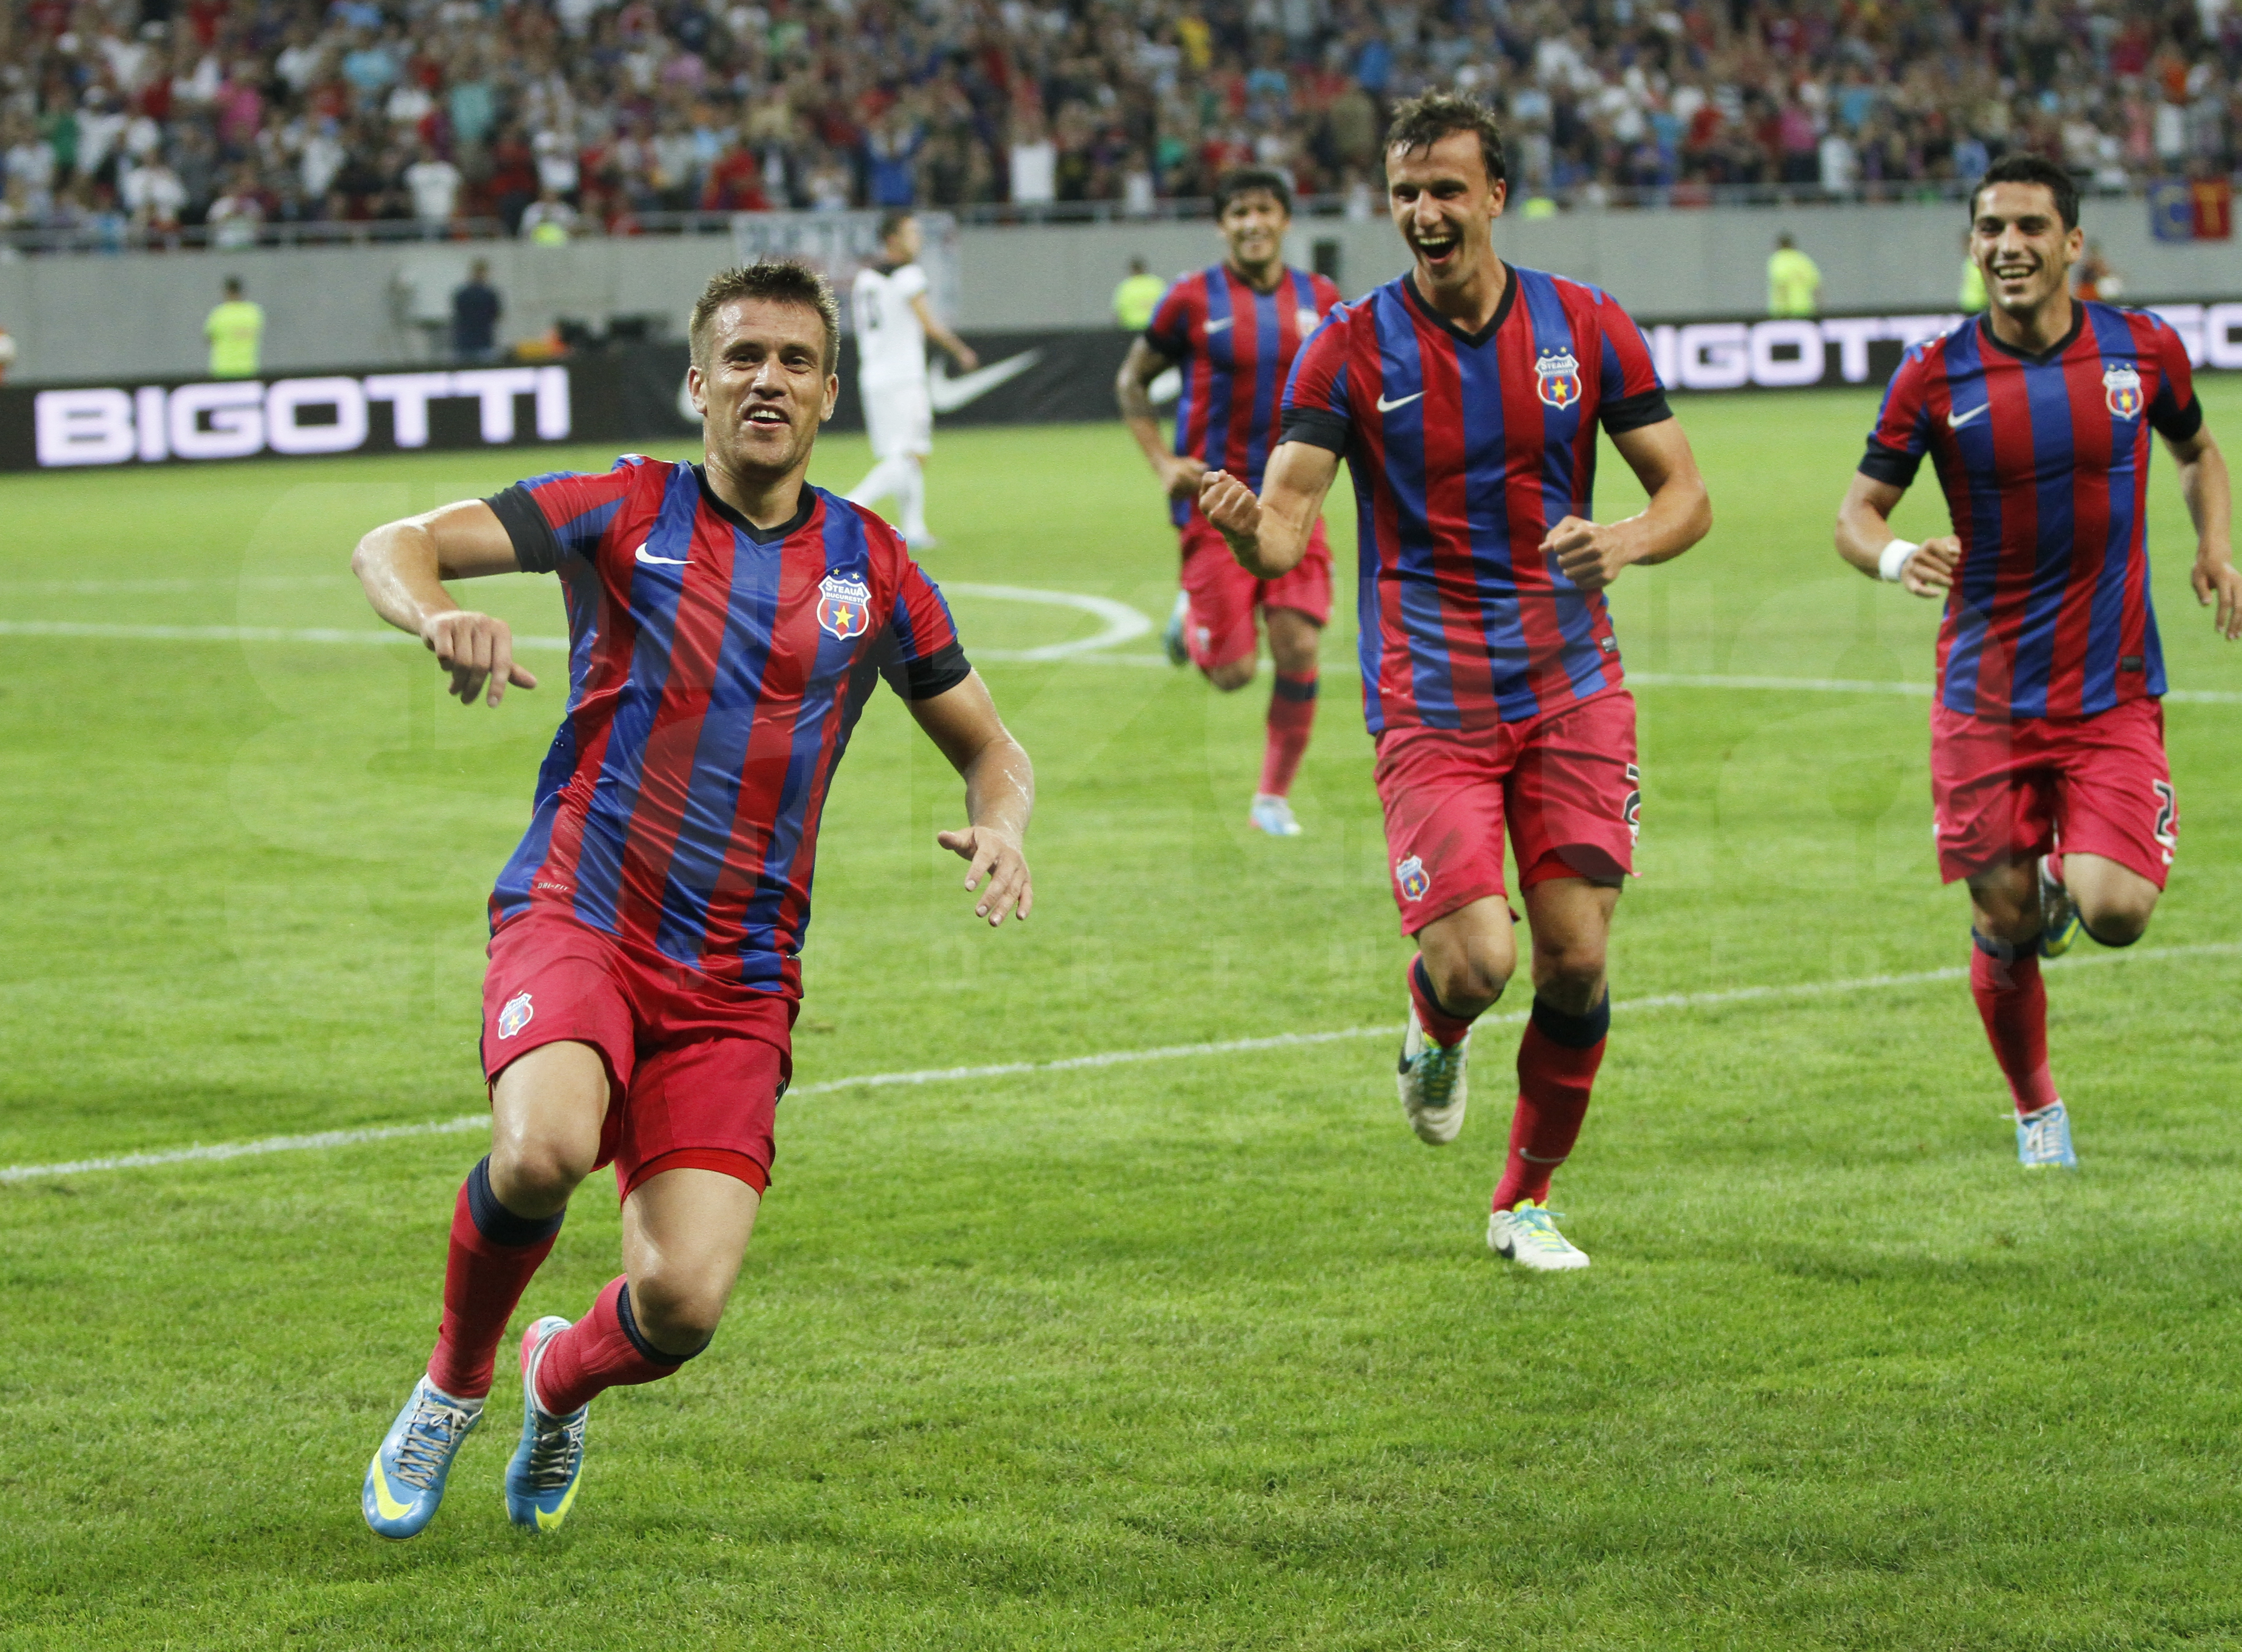 Steaua taie in carne vie: STEAUA – VARDAR 3-0, victoria 100 in Europa, in prima mansa a turului doi preliminar al Ligii Campionilor! VIDEO